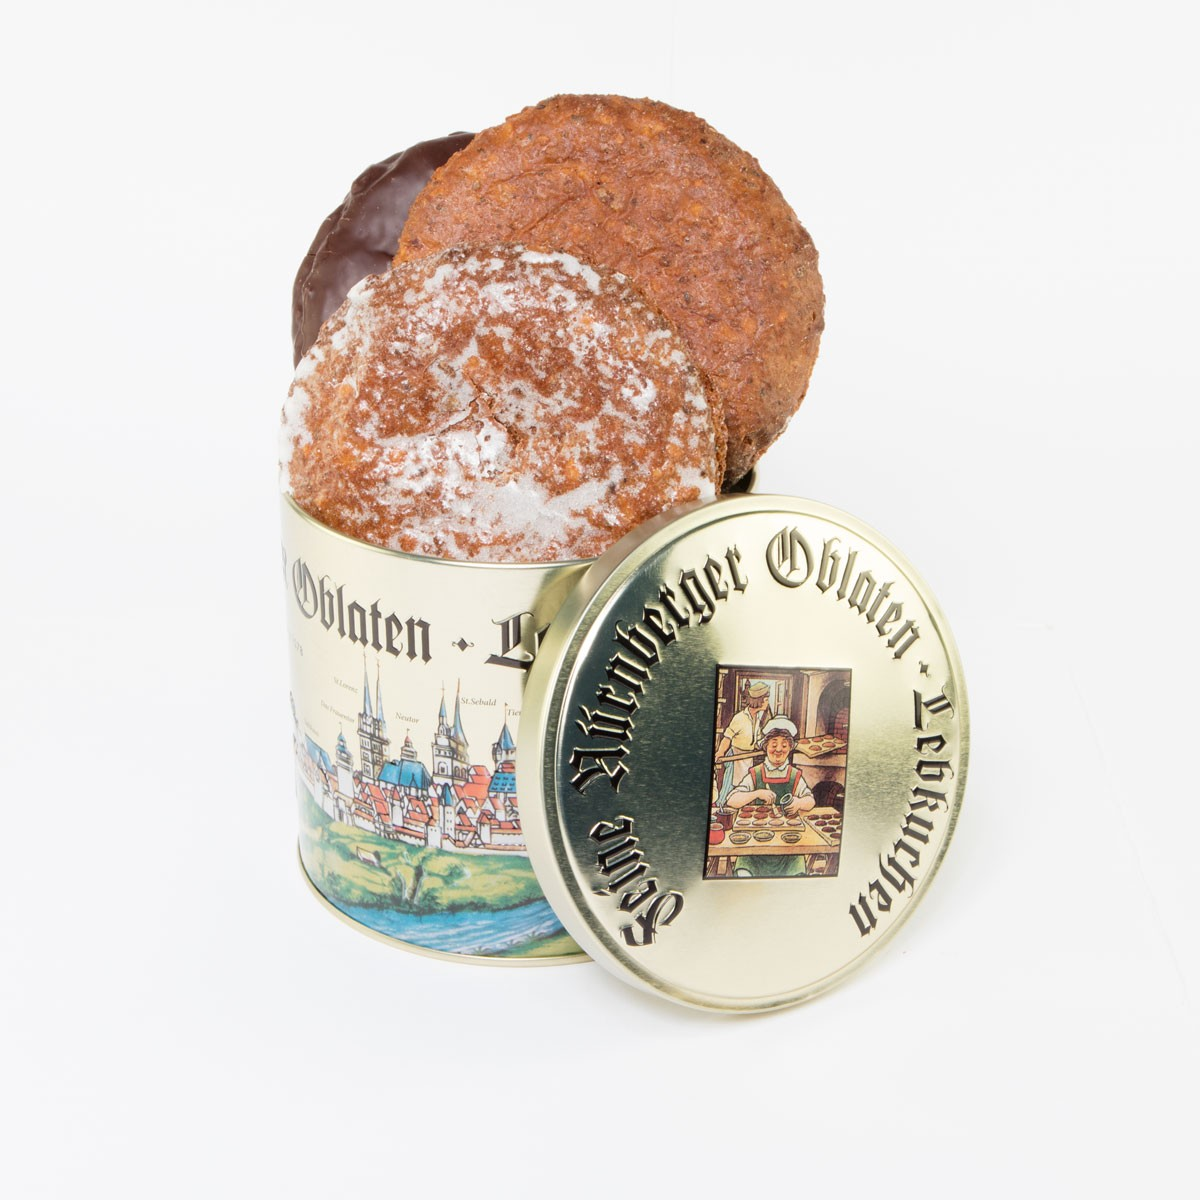 Original Nürnberger Oblatenlebkuchen